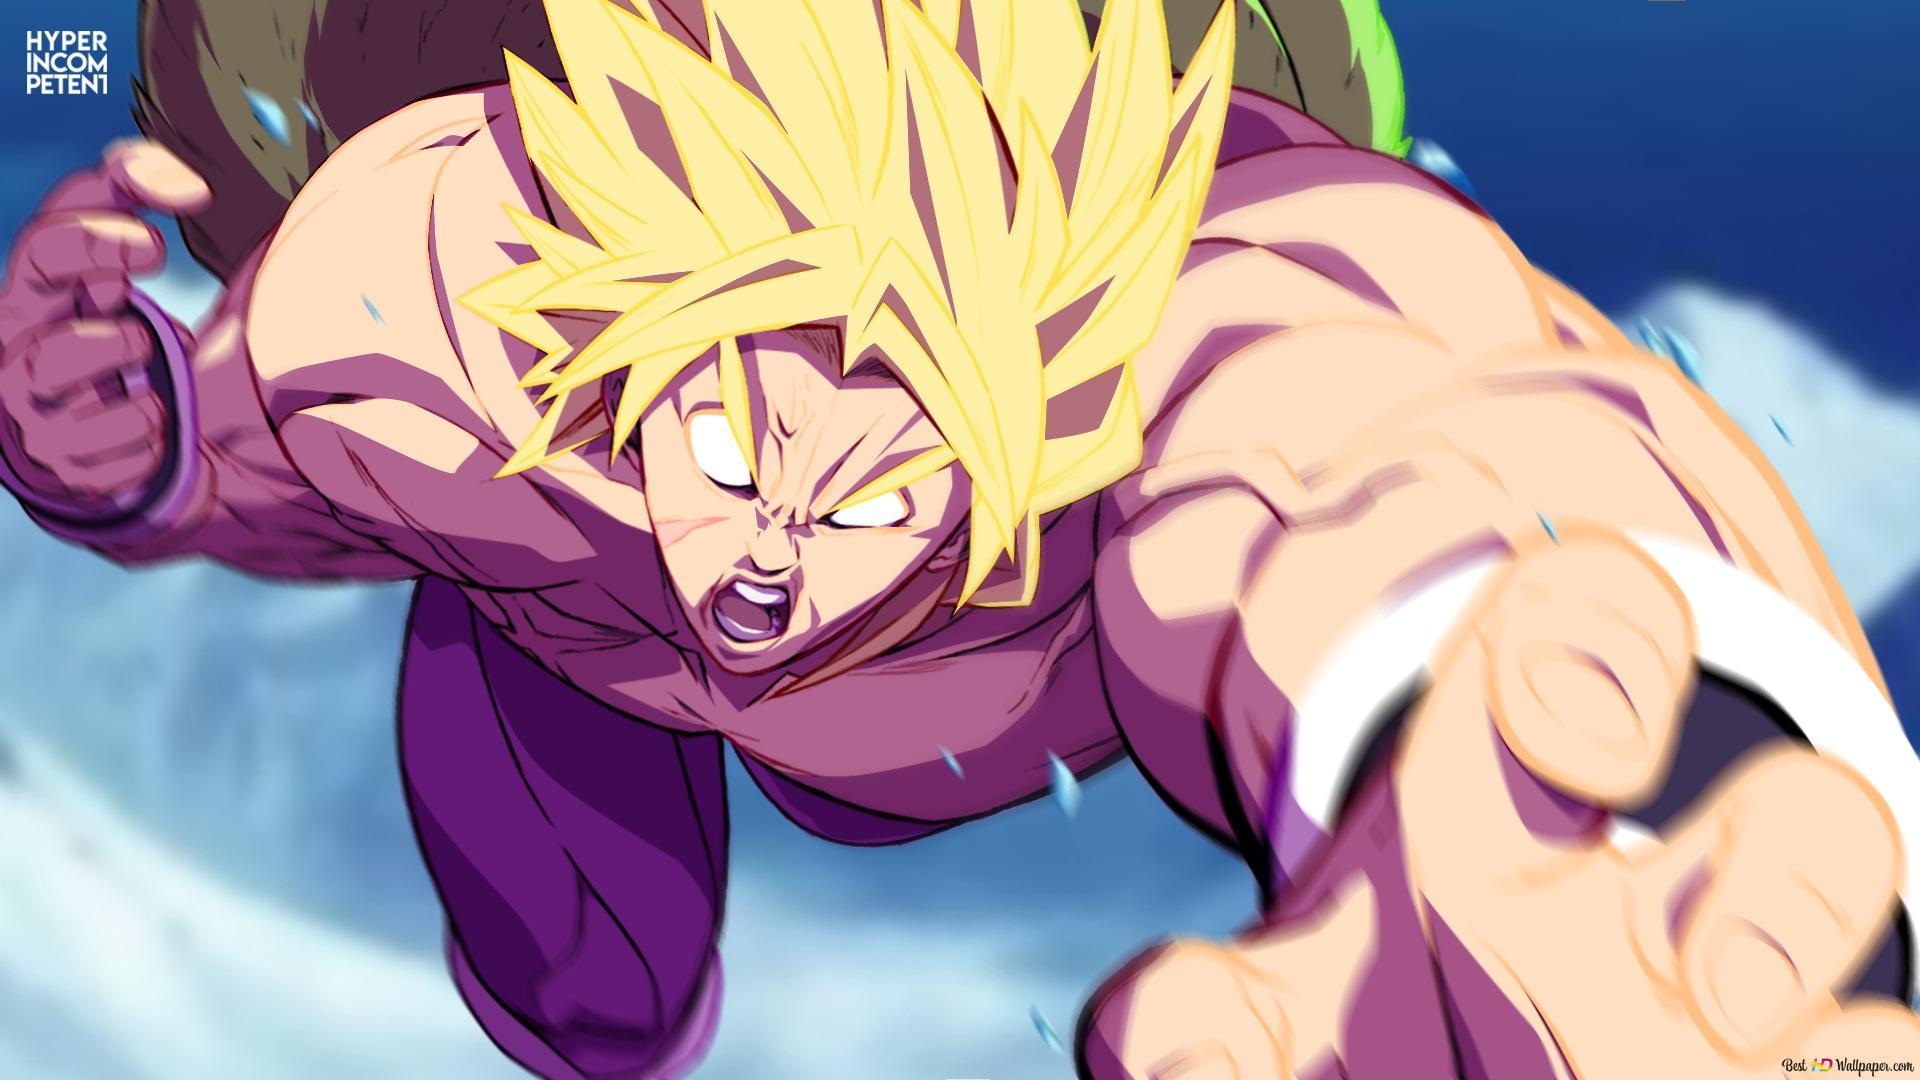 Dragon Ball Super Legendary Super Saiyan Broly Hd Wallpaper Download